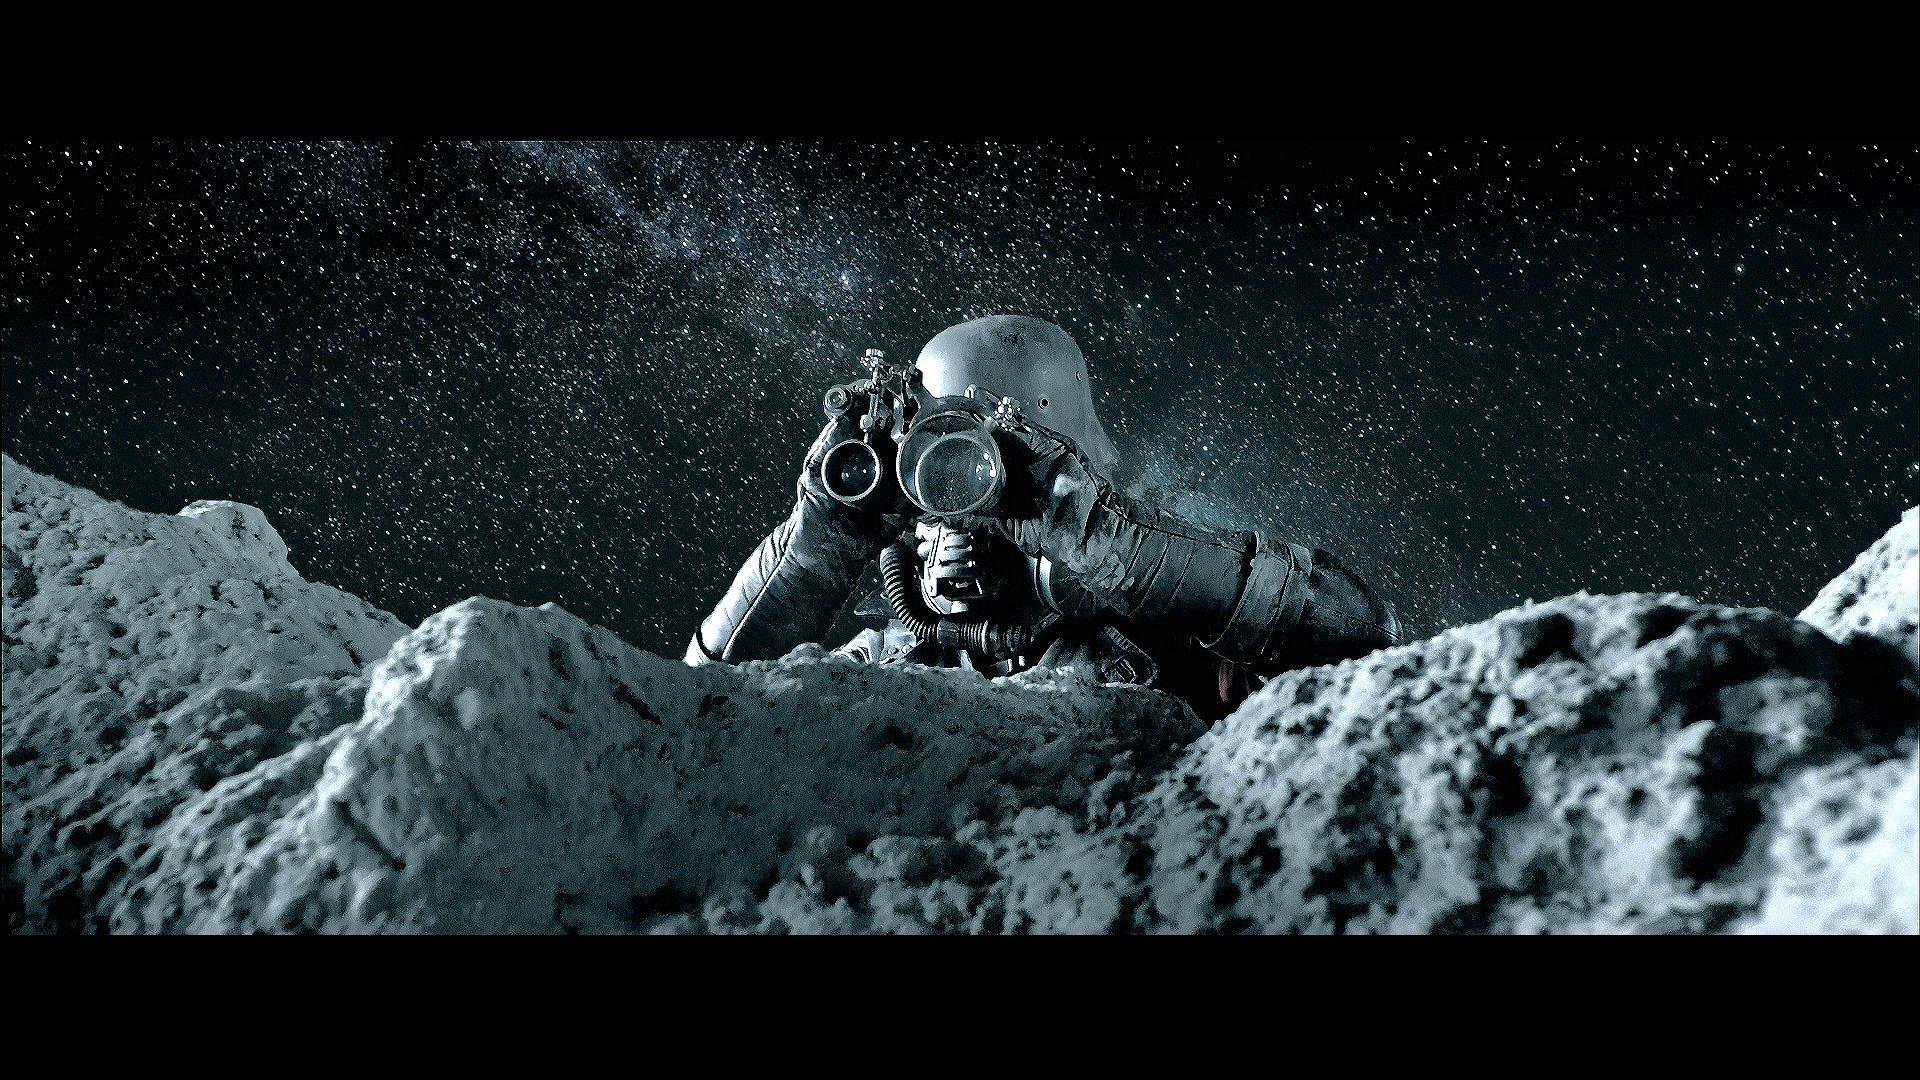 Мифы о Луне. Лунный заговор, полая Луна, русские на Луне 9